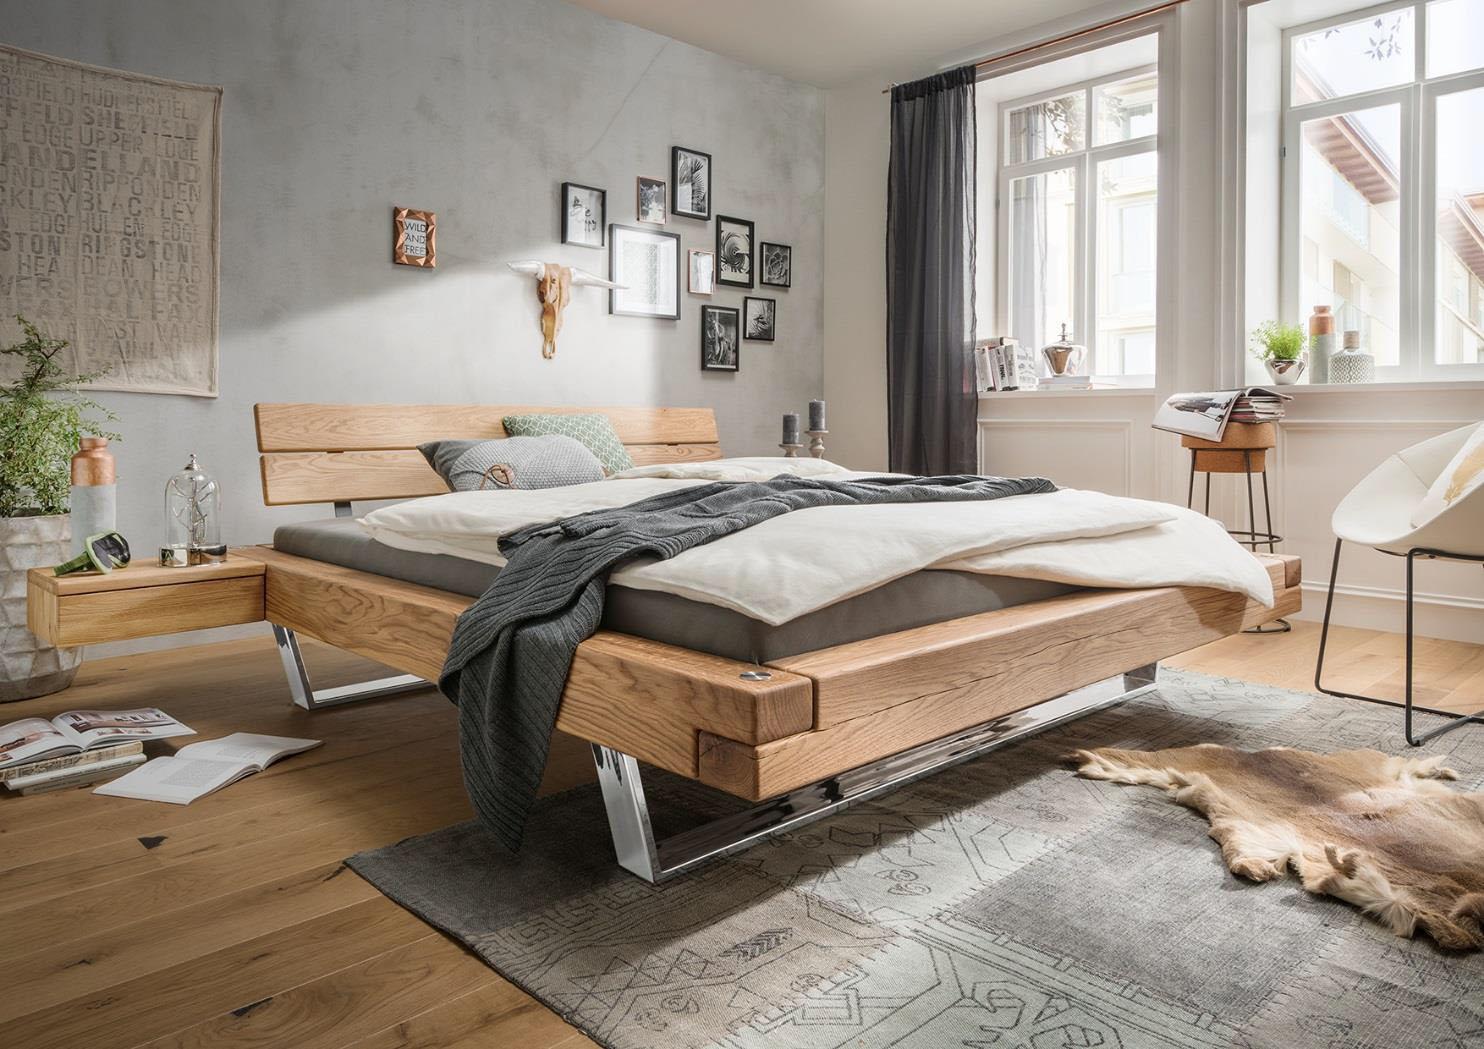 schwebebalkenbett aalborg wildeiche massiv ge lt g nstig massiva m. Black Bedroom Furniture Sets. Home Design Ideas